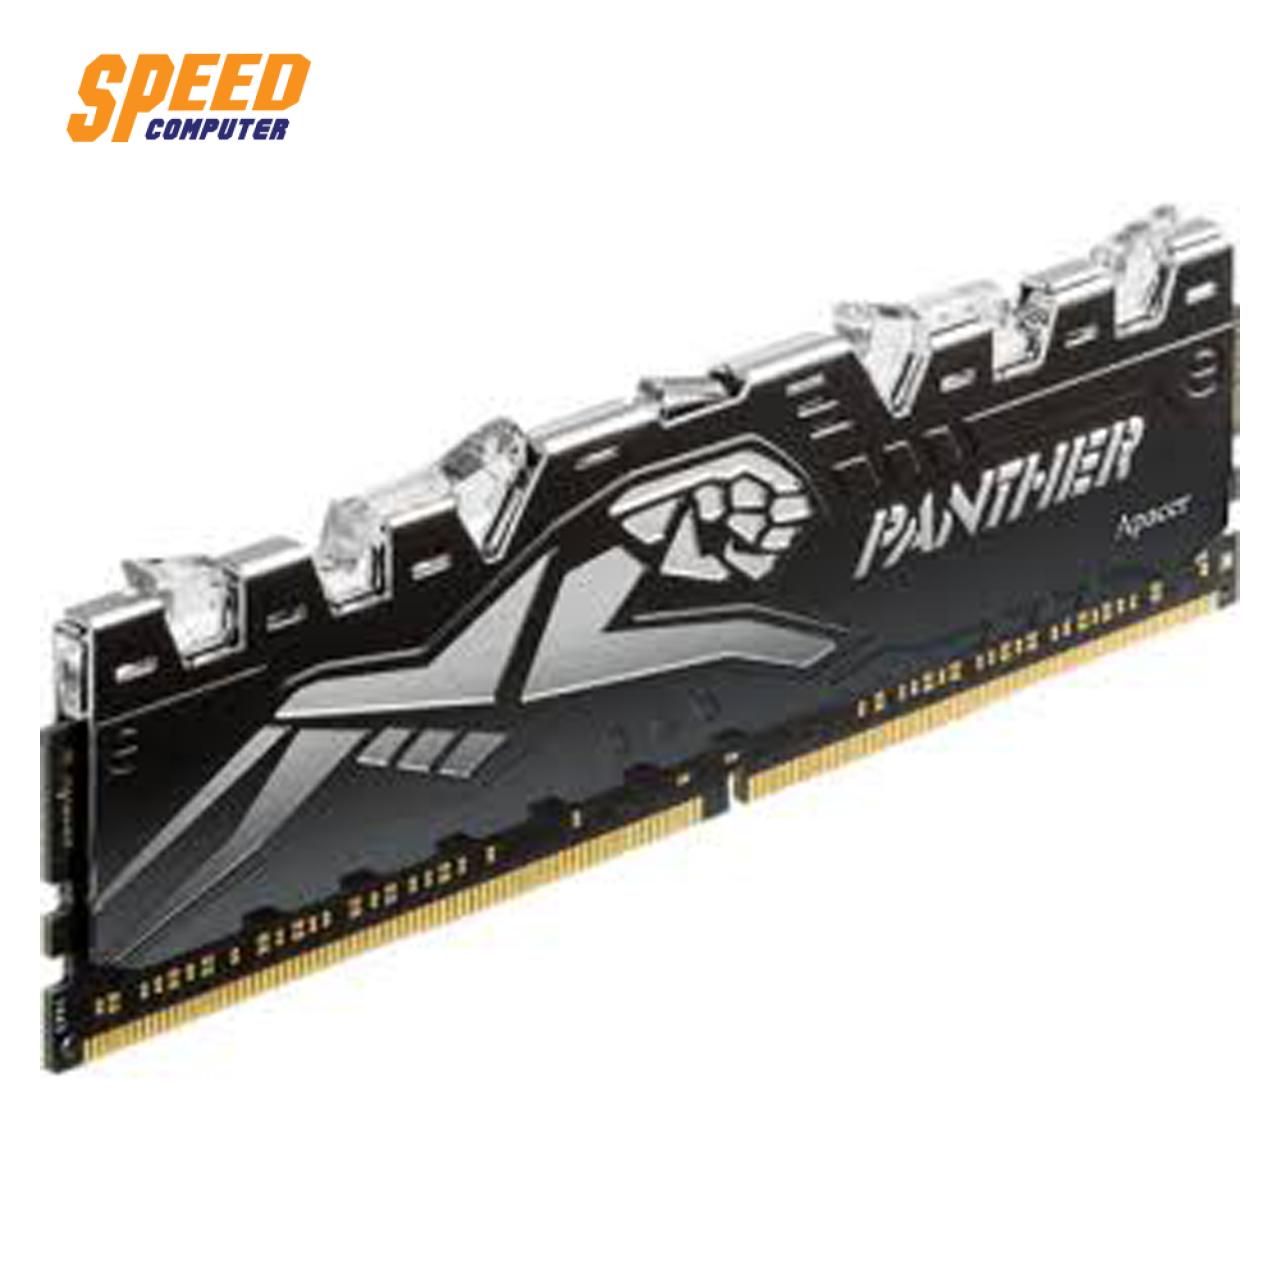 RAM-APA-4D42400LE